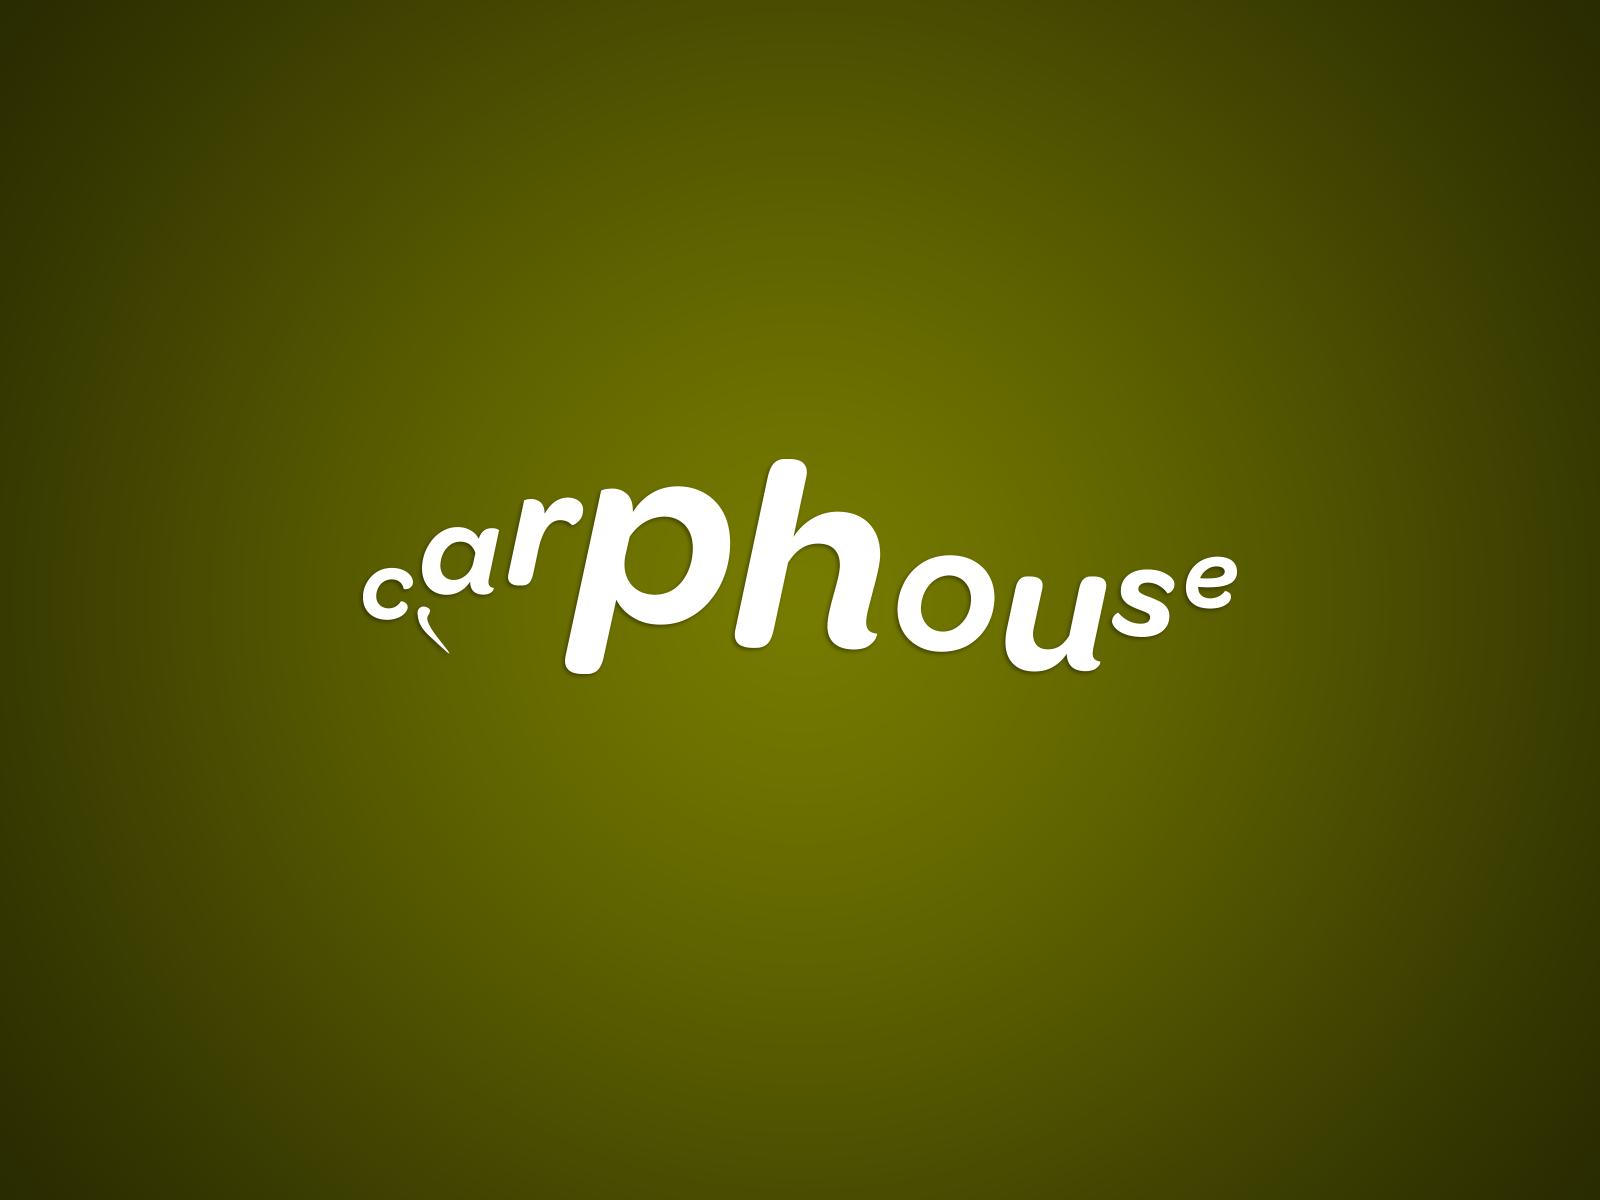 carphouse Logotype / concept